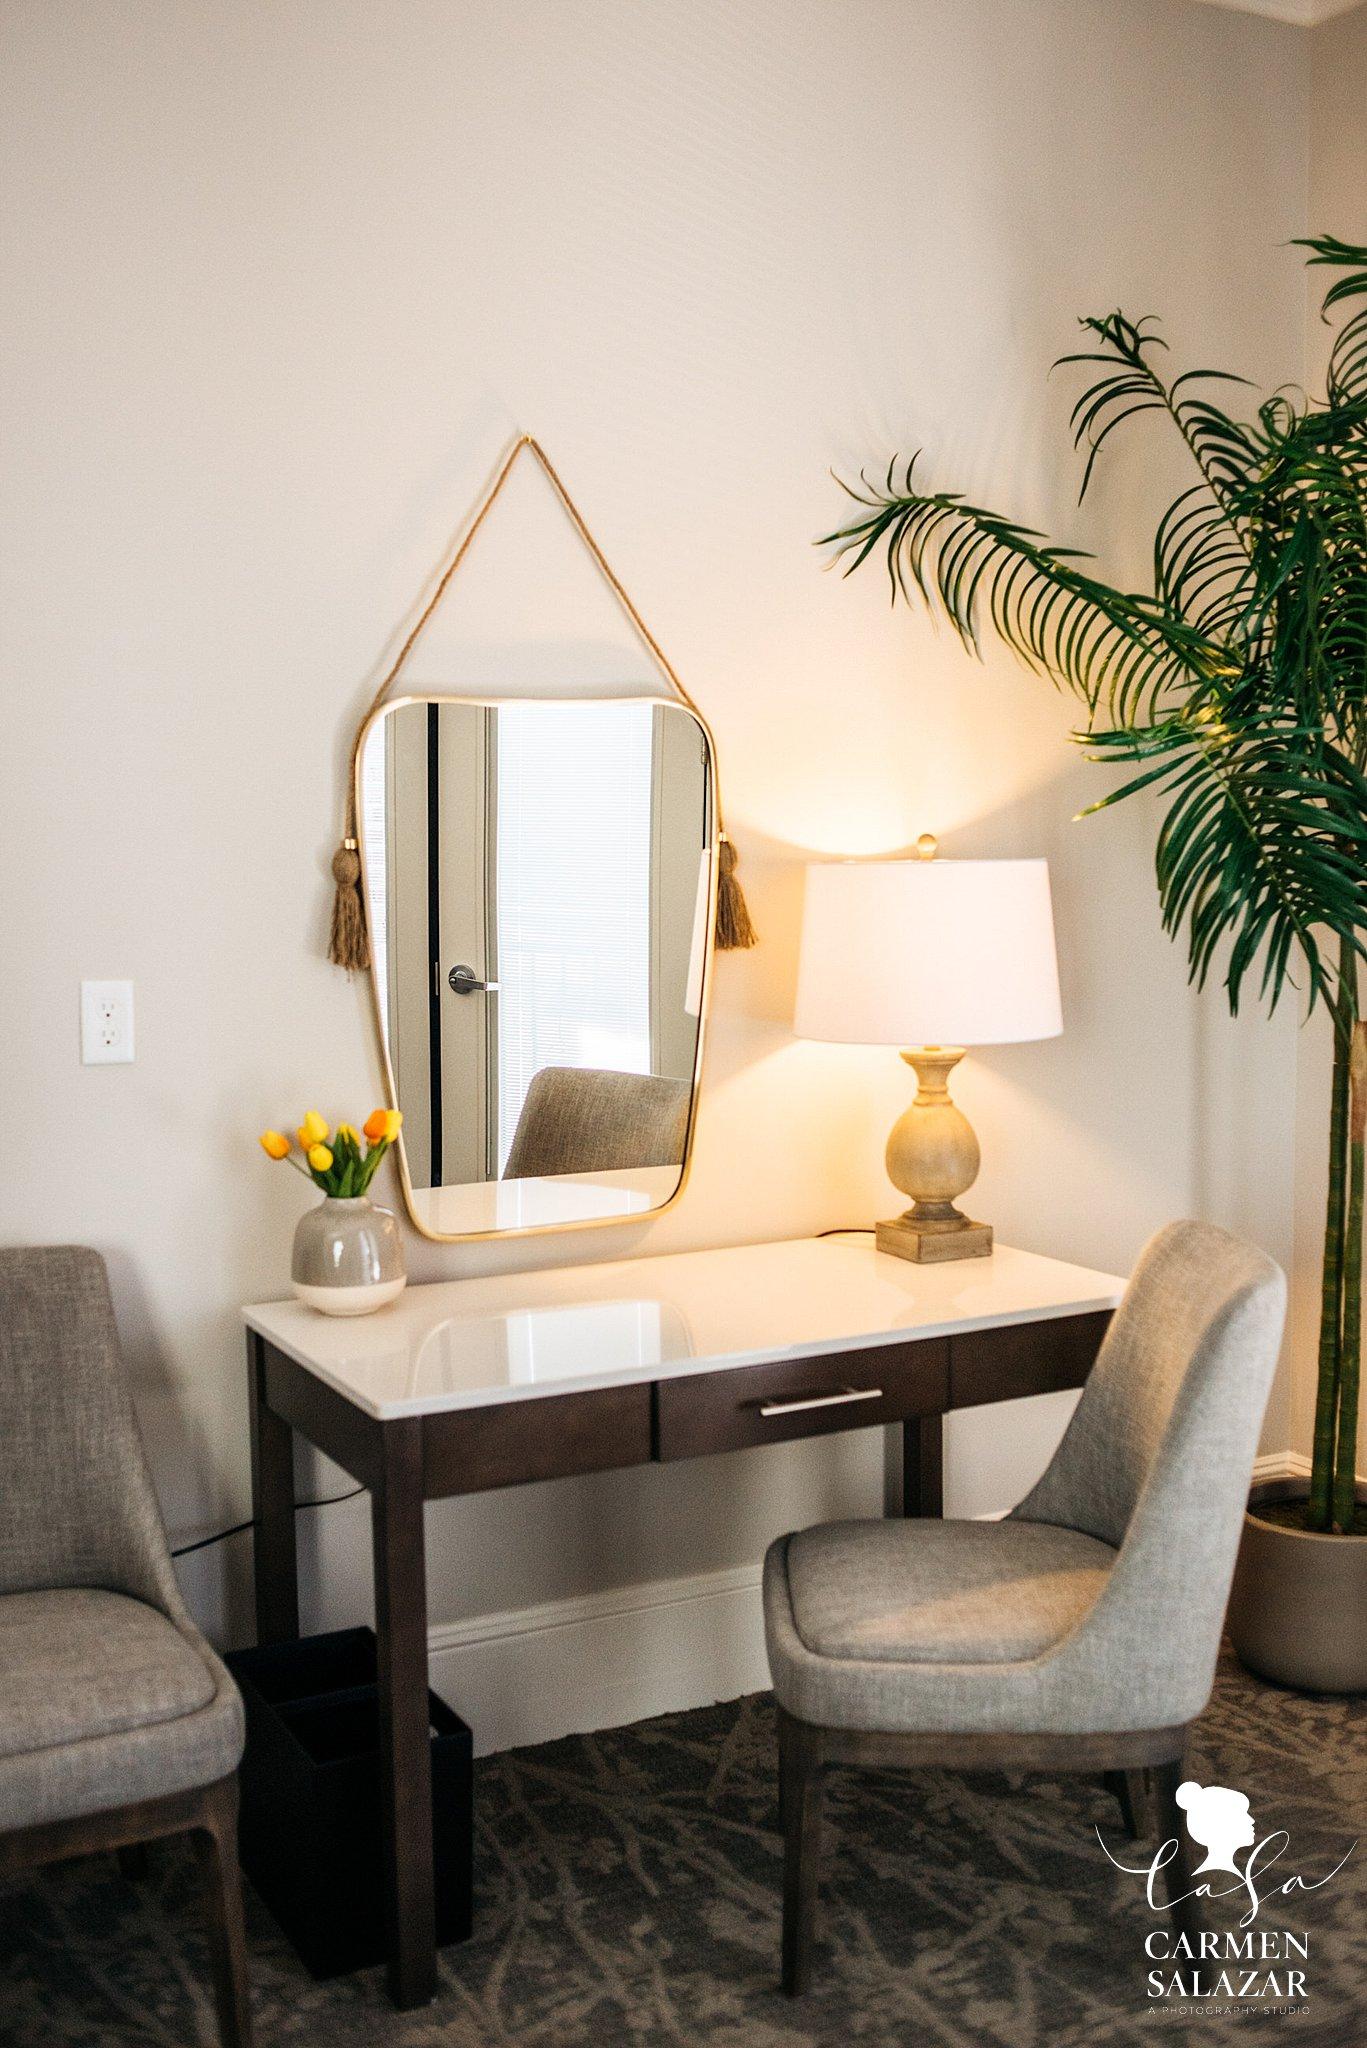 Modern vanity mirror in a wedding hotel